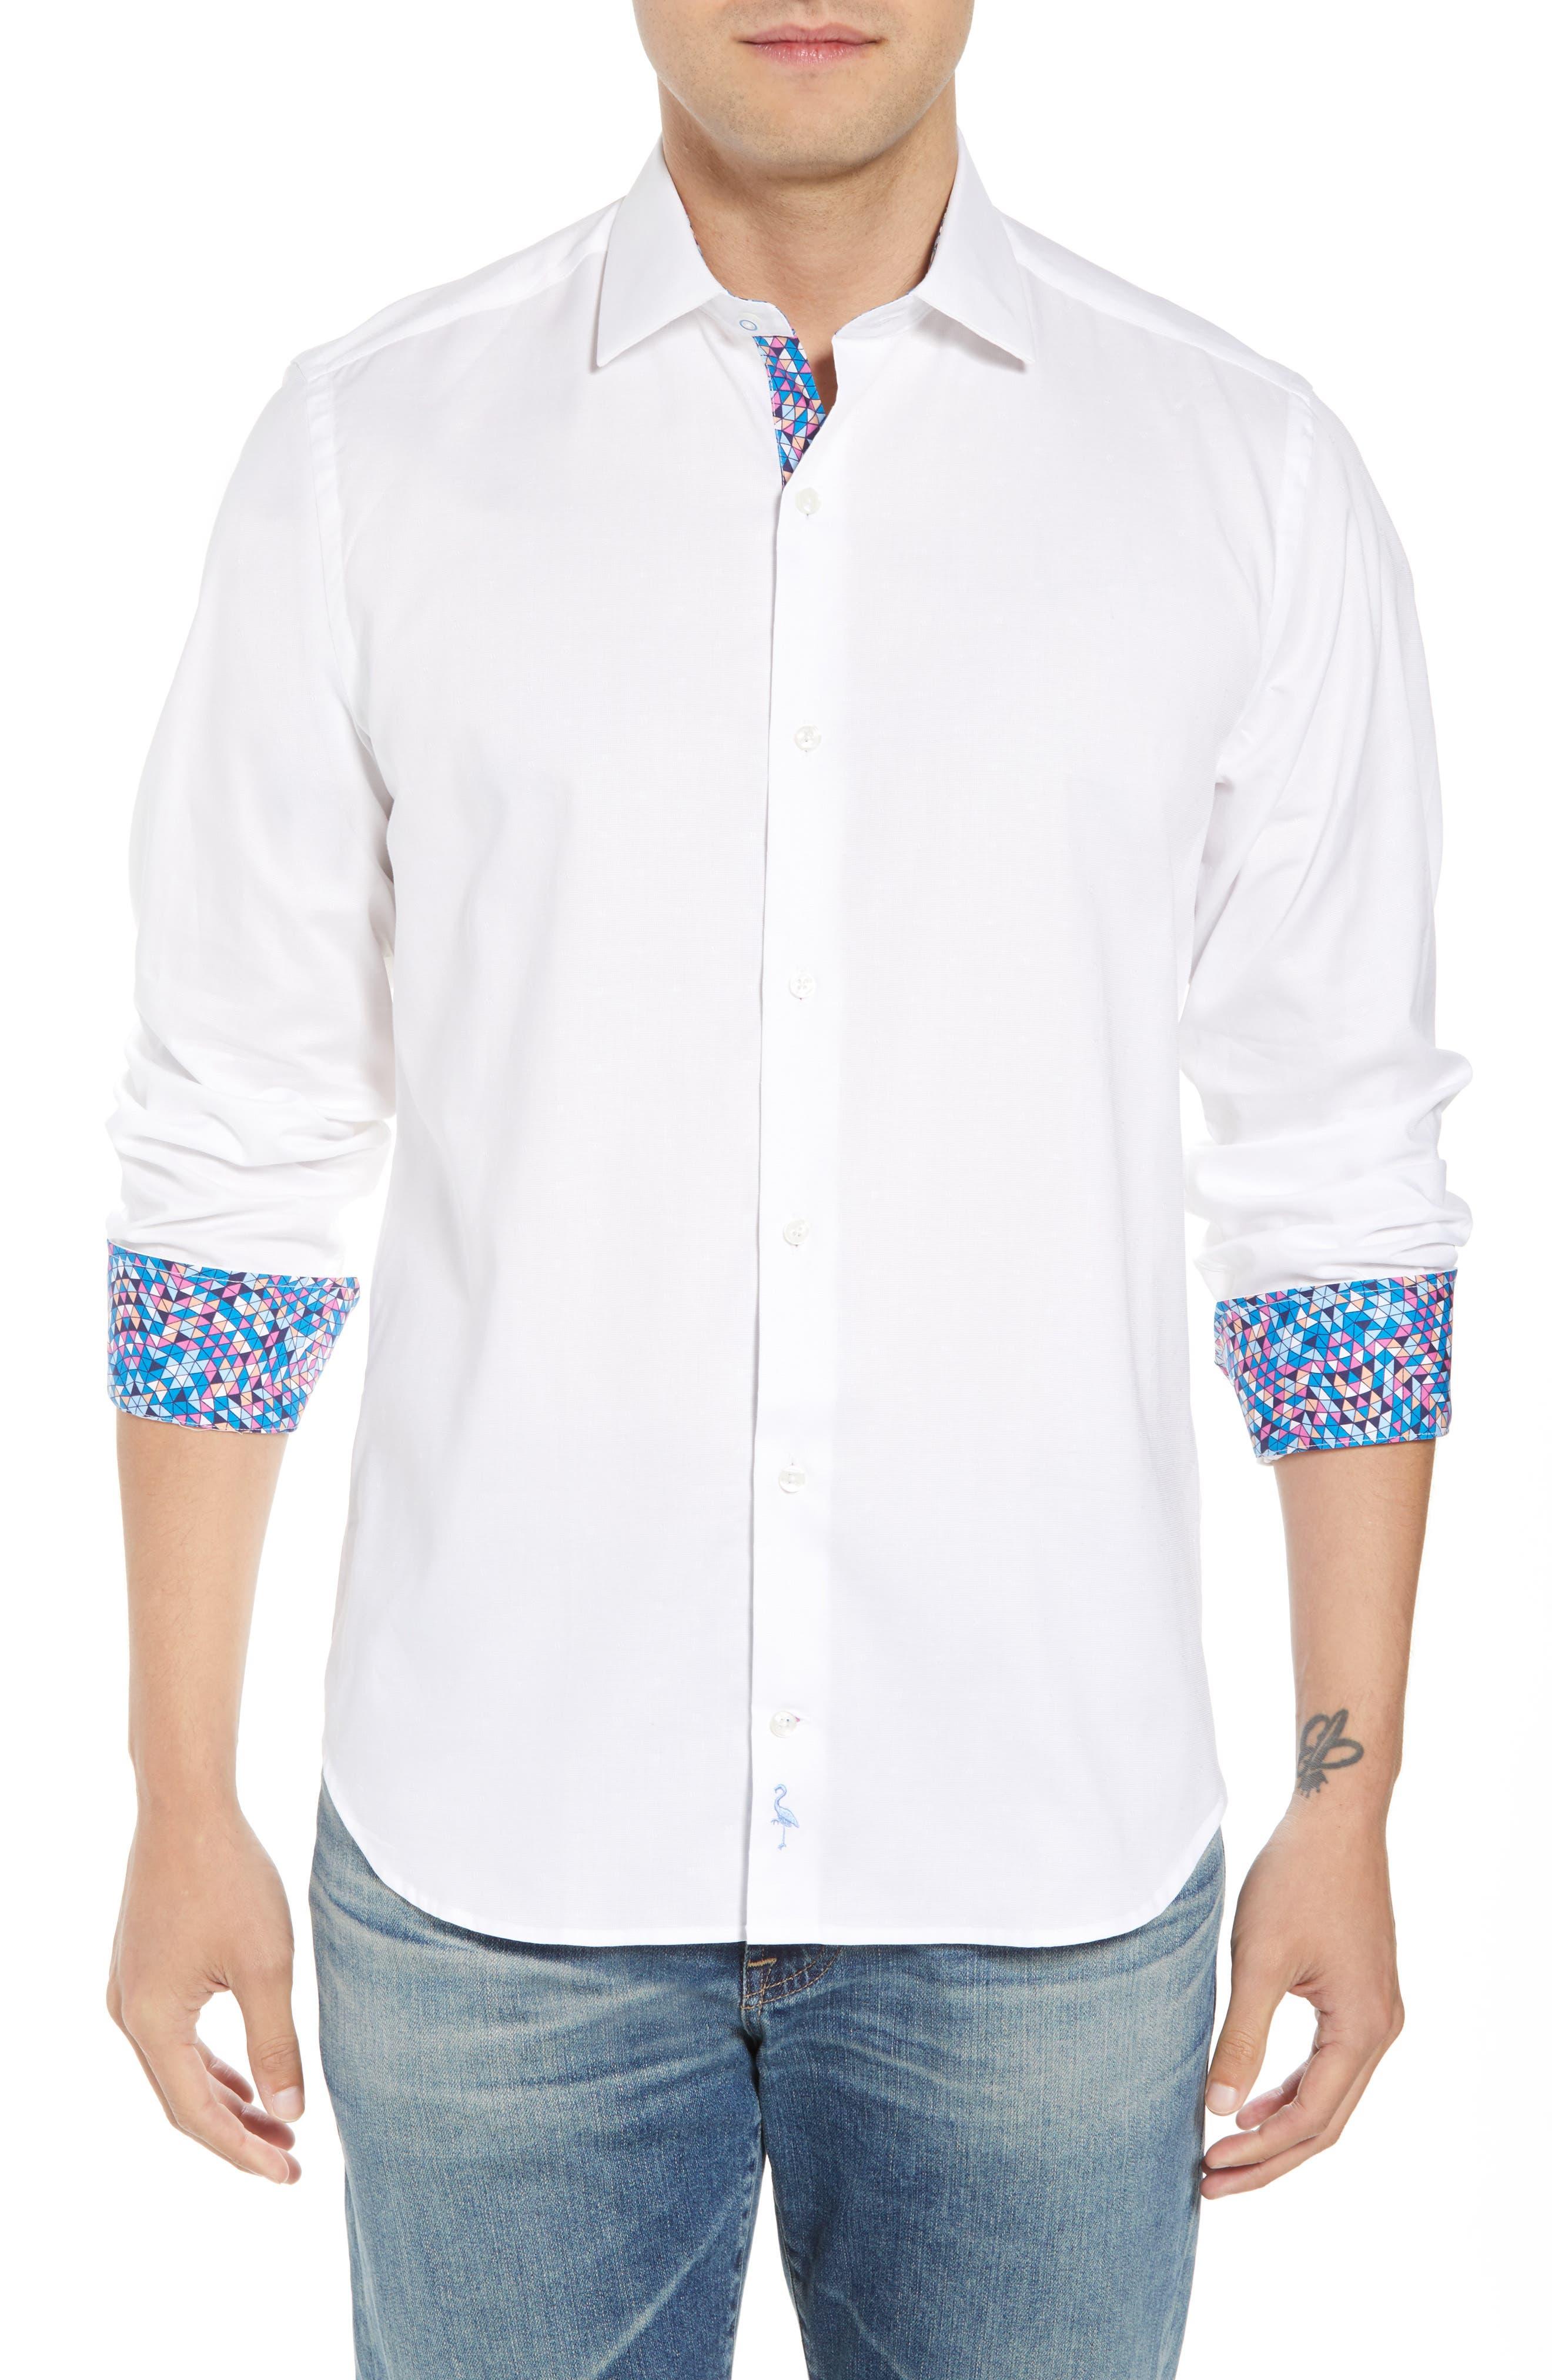 Baxley Regular Fit Sport Shirt,                             Main thumbnail 1, color,